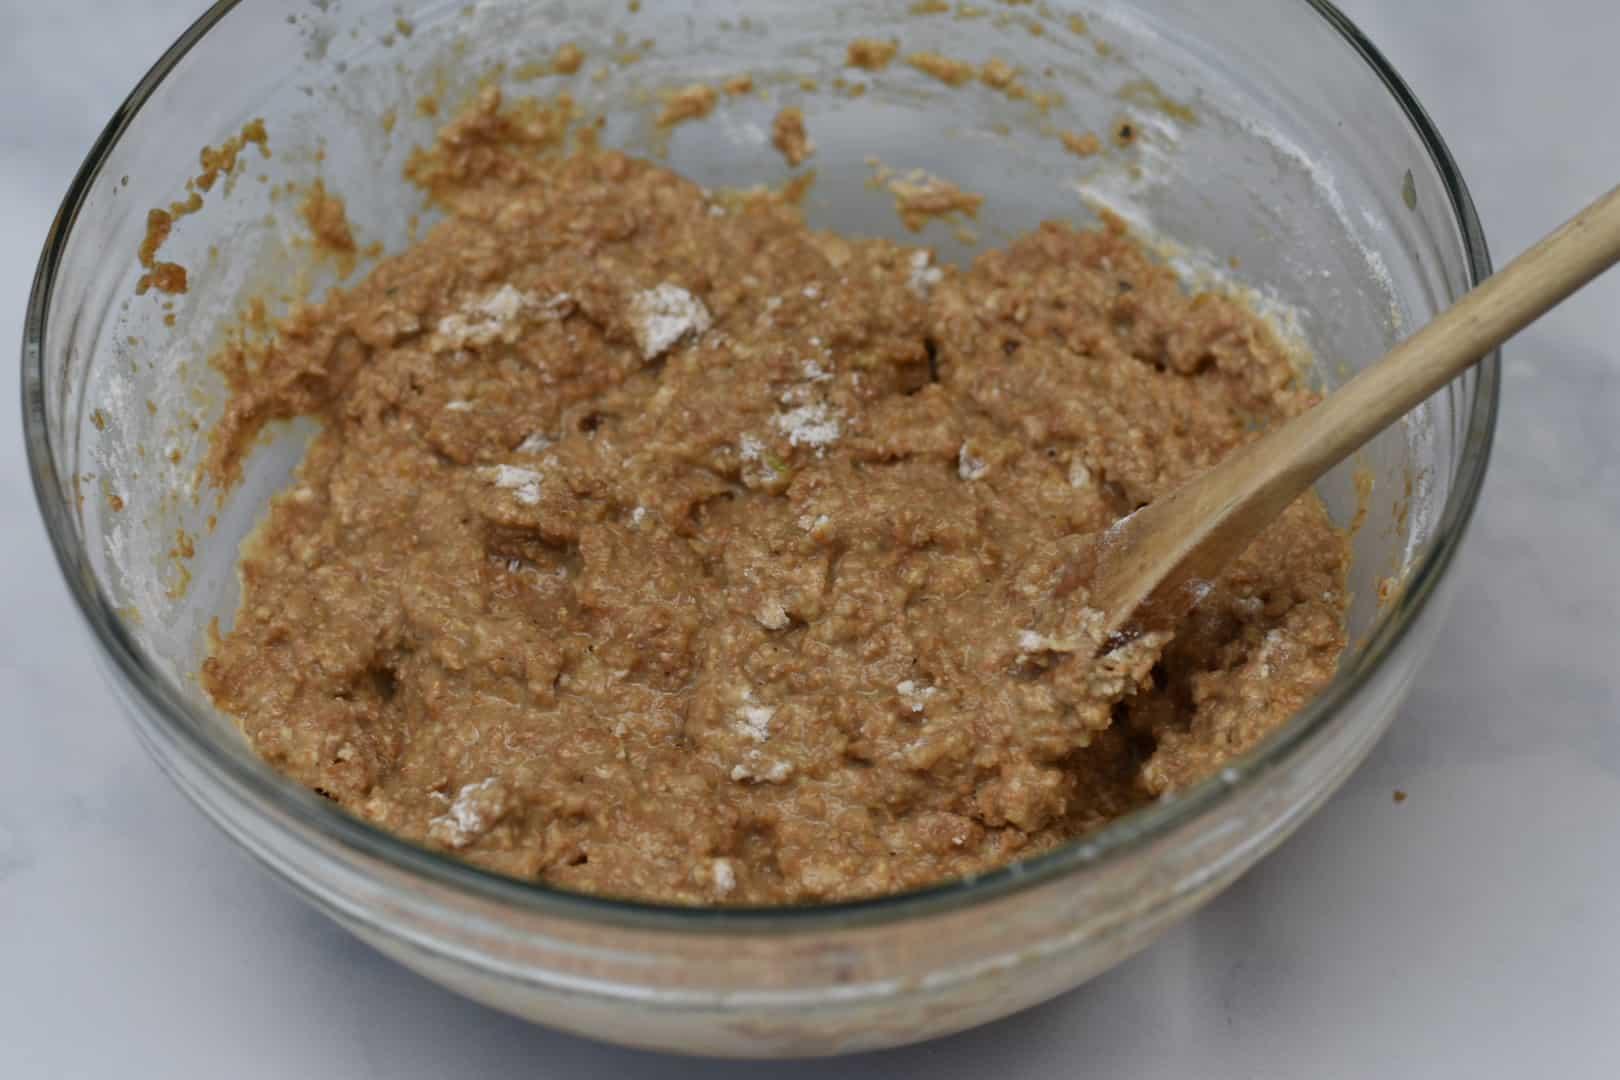 mixed batter for miniature bran muffins